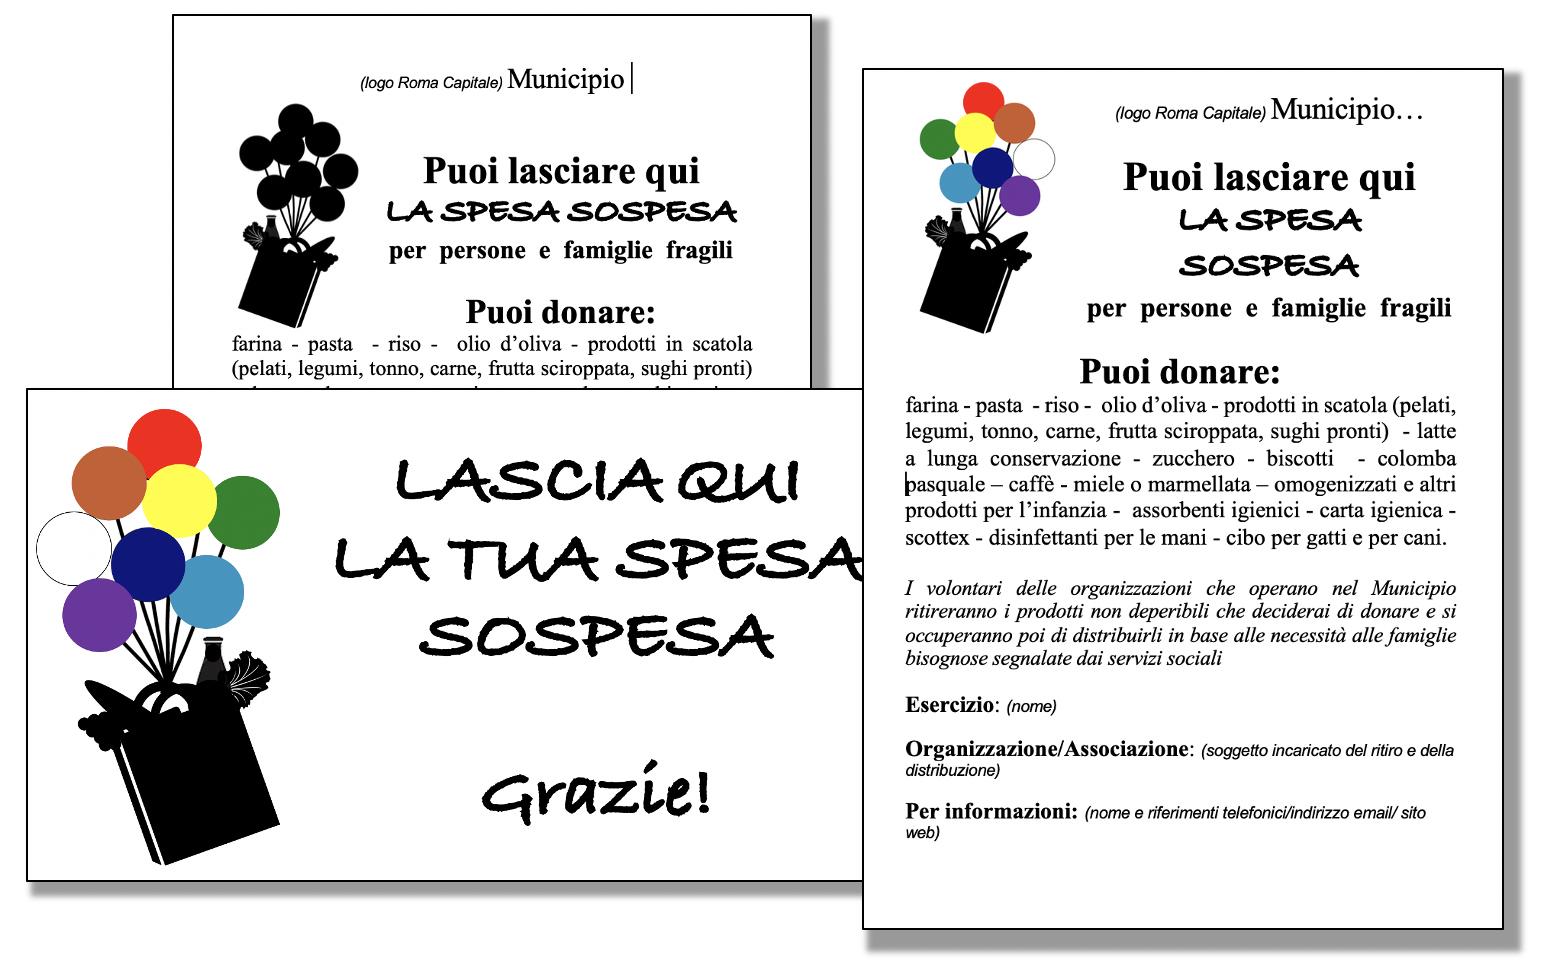 mosaico spesa sospesa locandine carteinregola 2